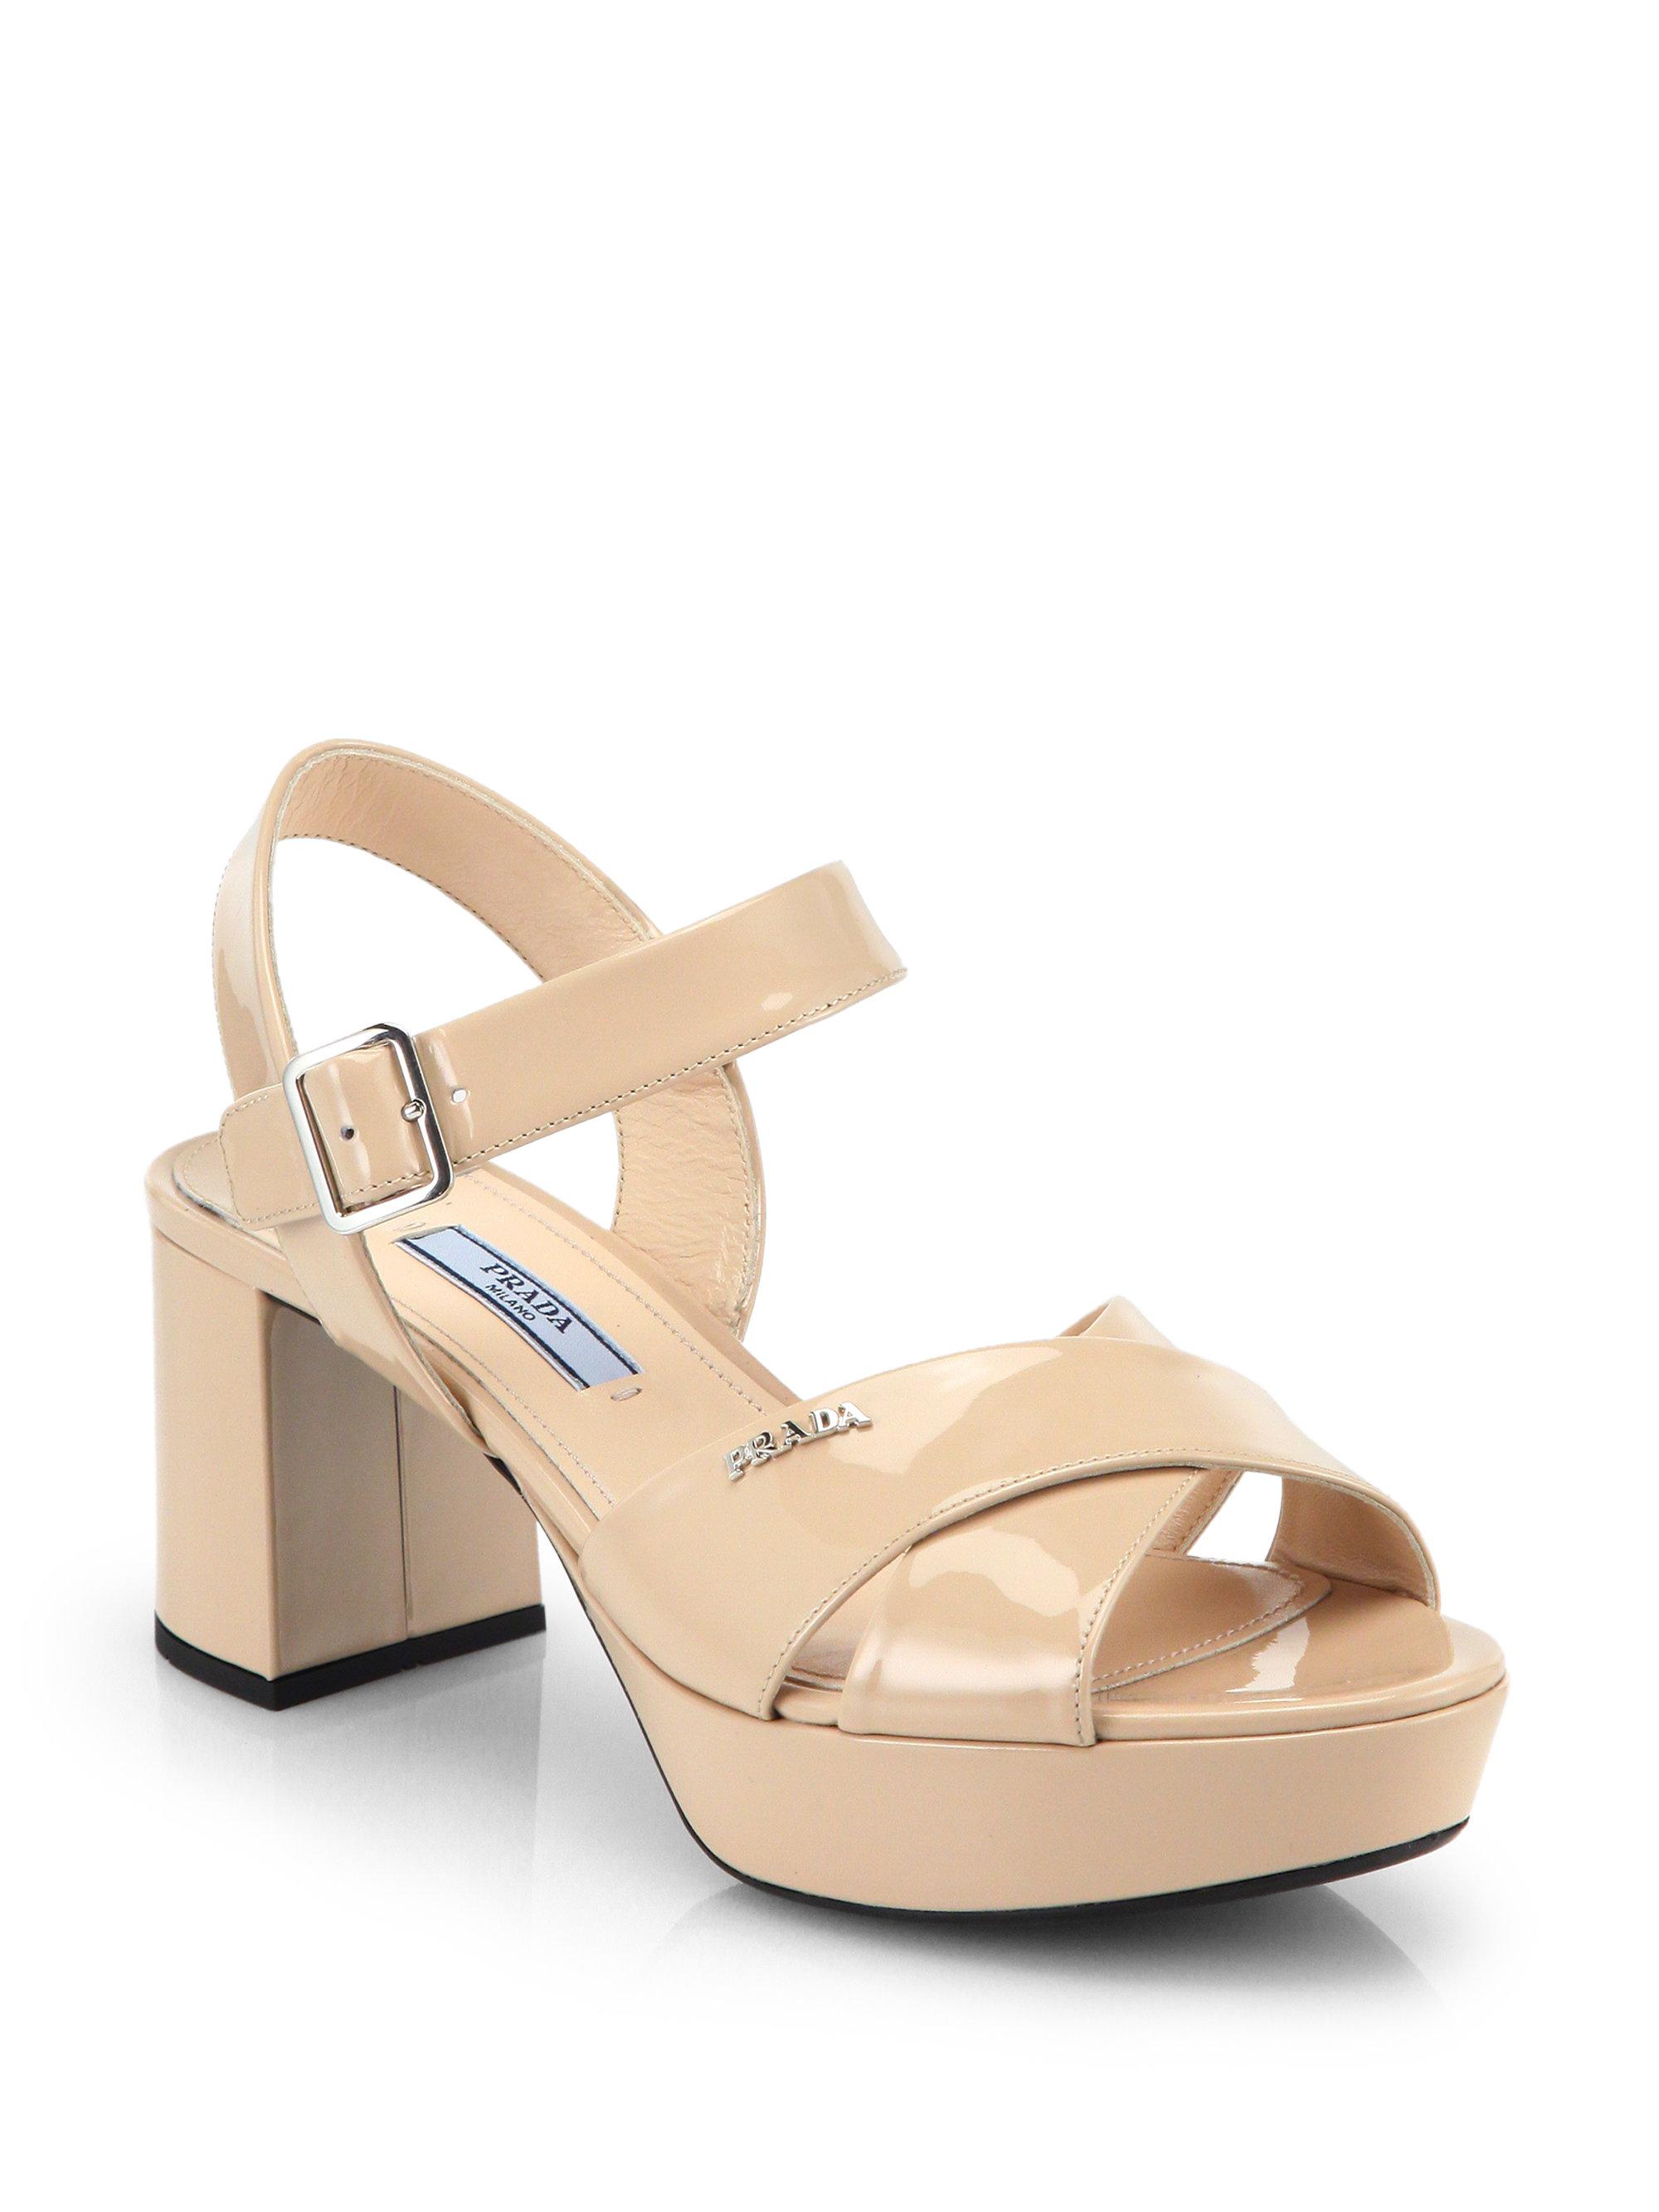 d5cc235eed8 Lyst - Prada Patent Leather Crisscross Platform Sandals in Natural